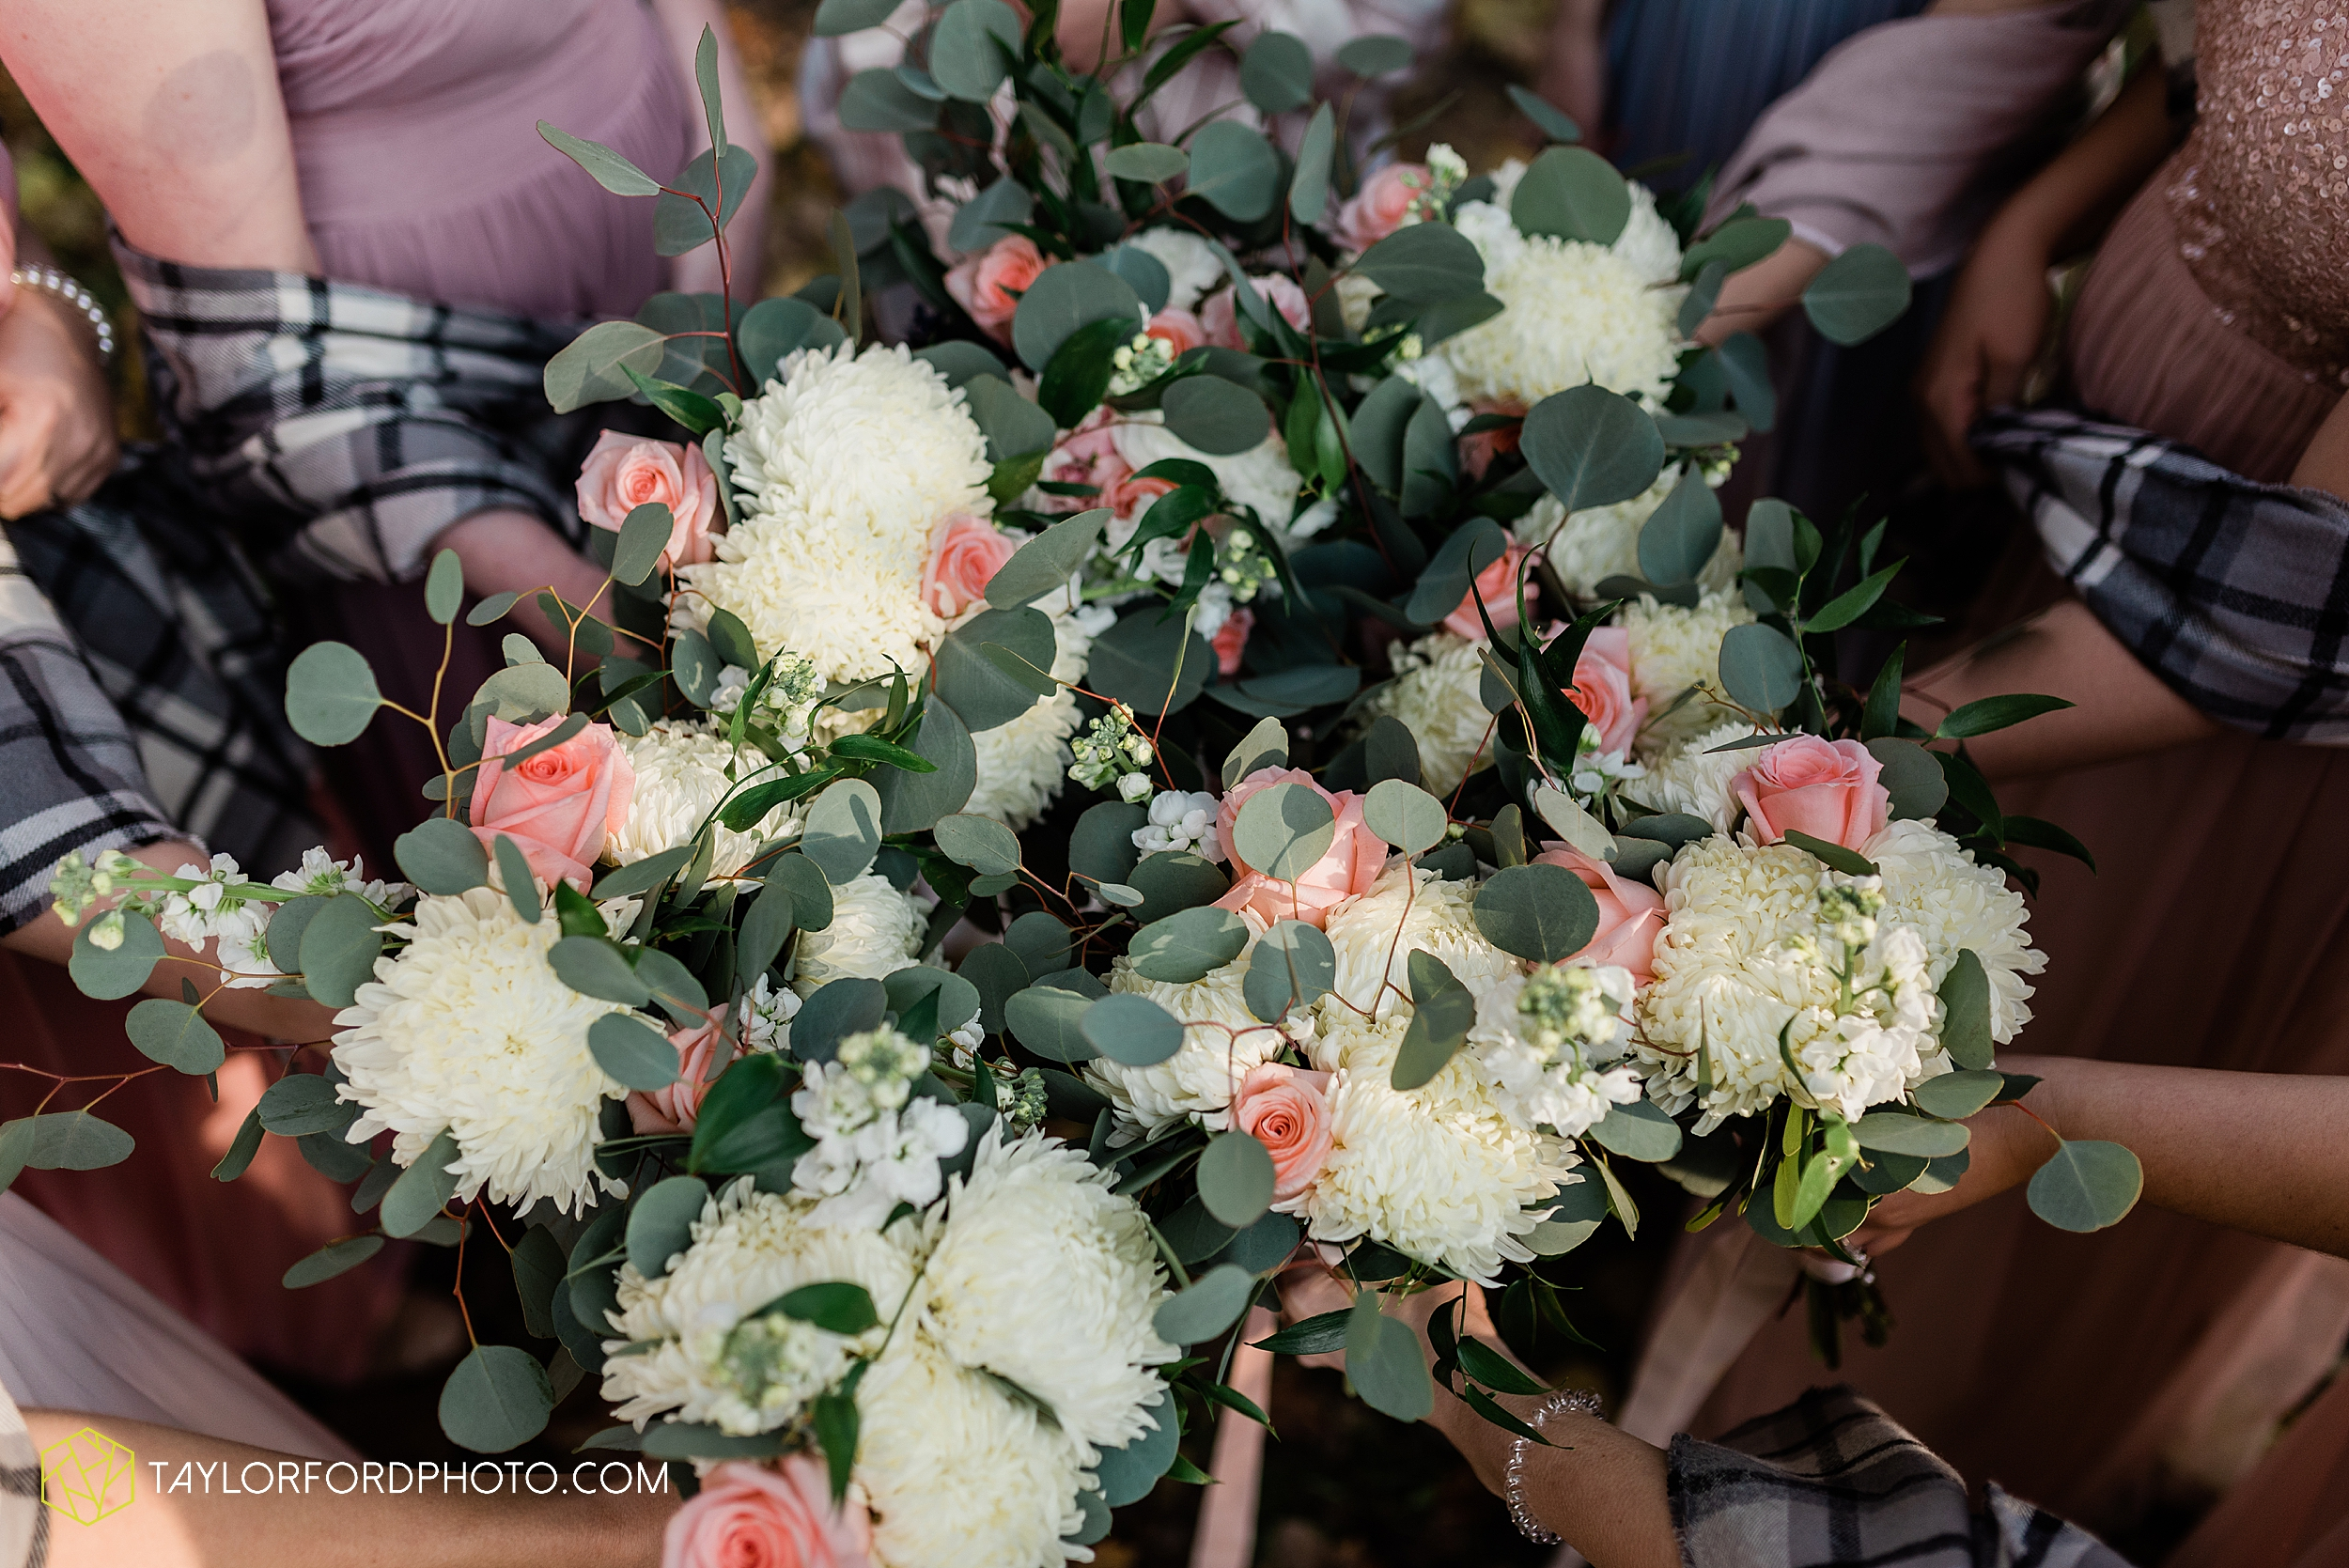 marissa-nicole-nick-daeger-orrmont-estate-farm-wedding-piqua-dayton-troy-ohio-fall-photographer-taylor-ford-photography_1539.jpg